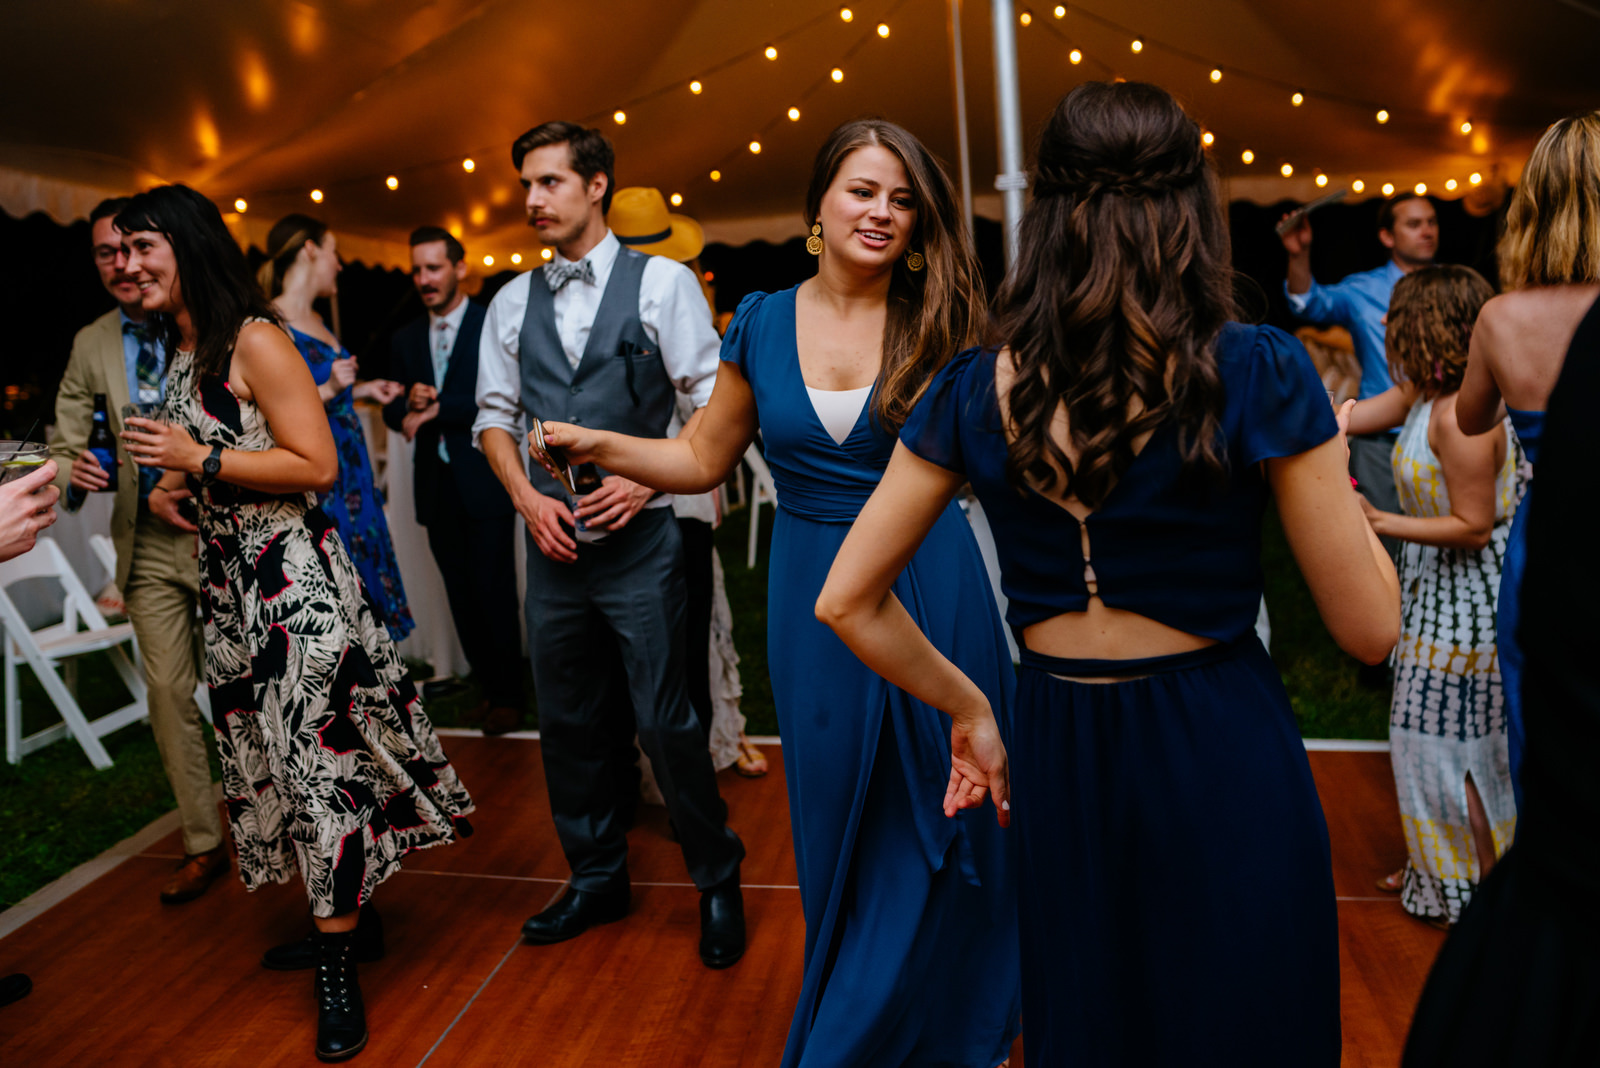 wedding reception moments holly hill inn